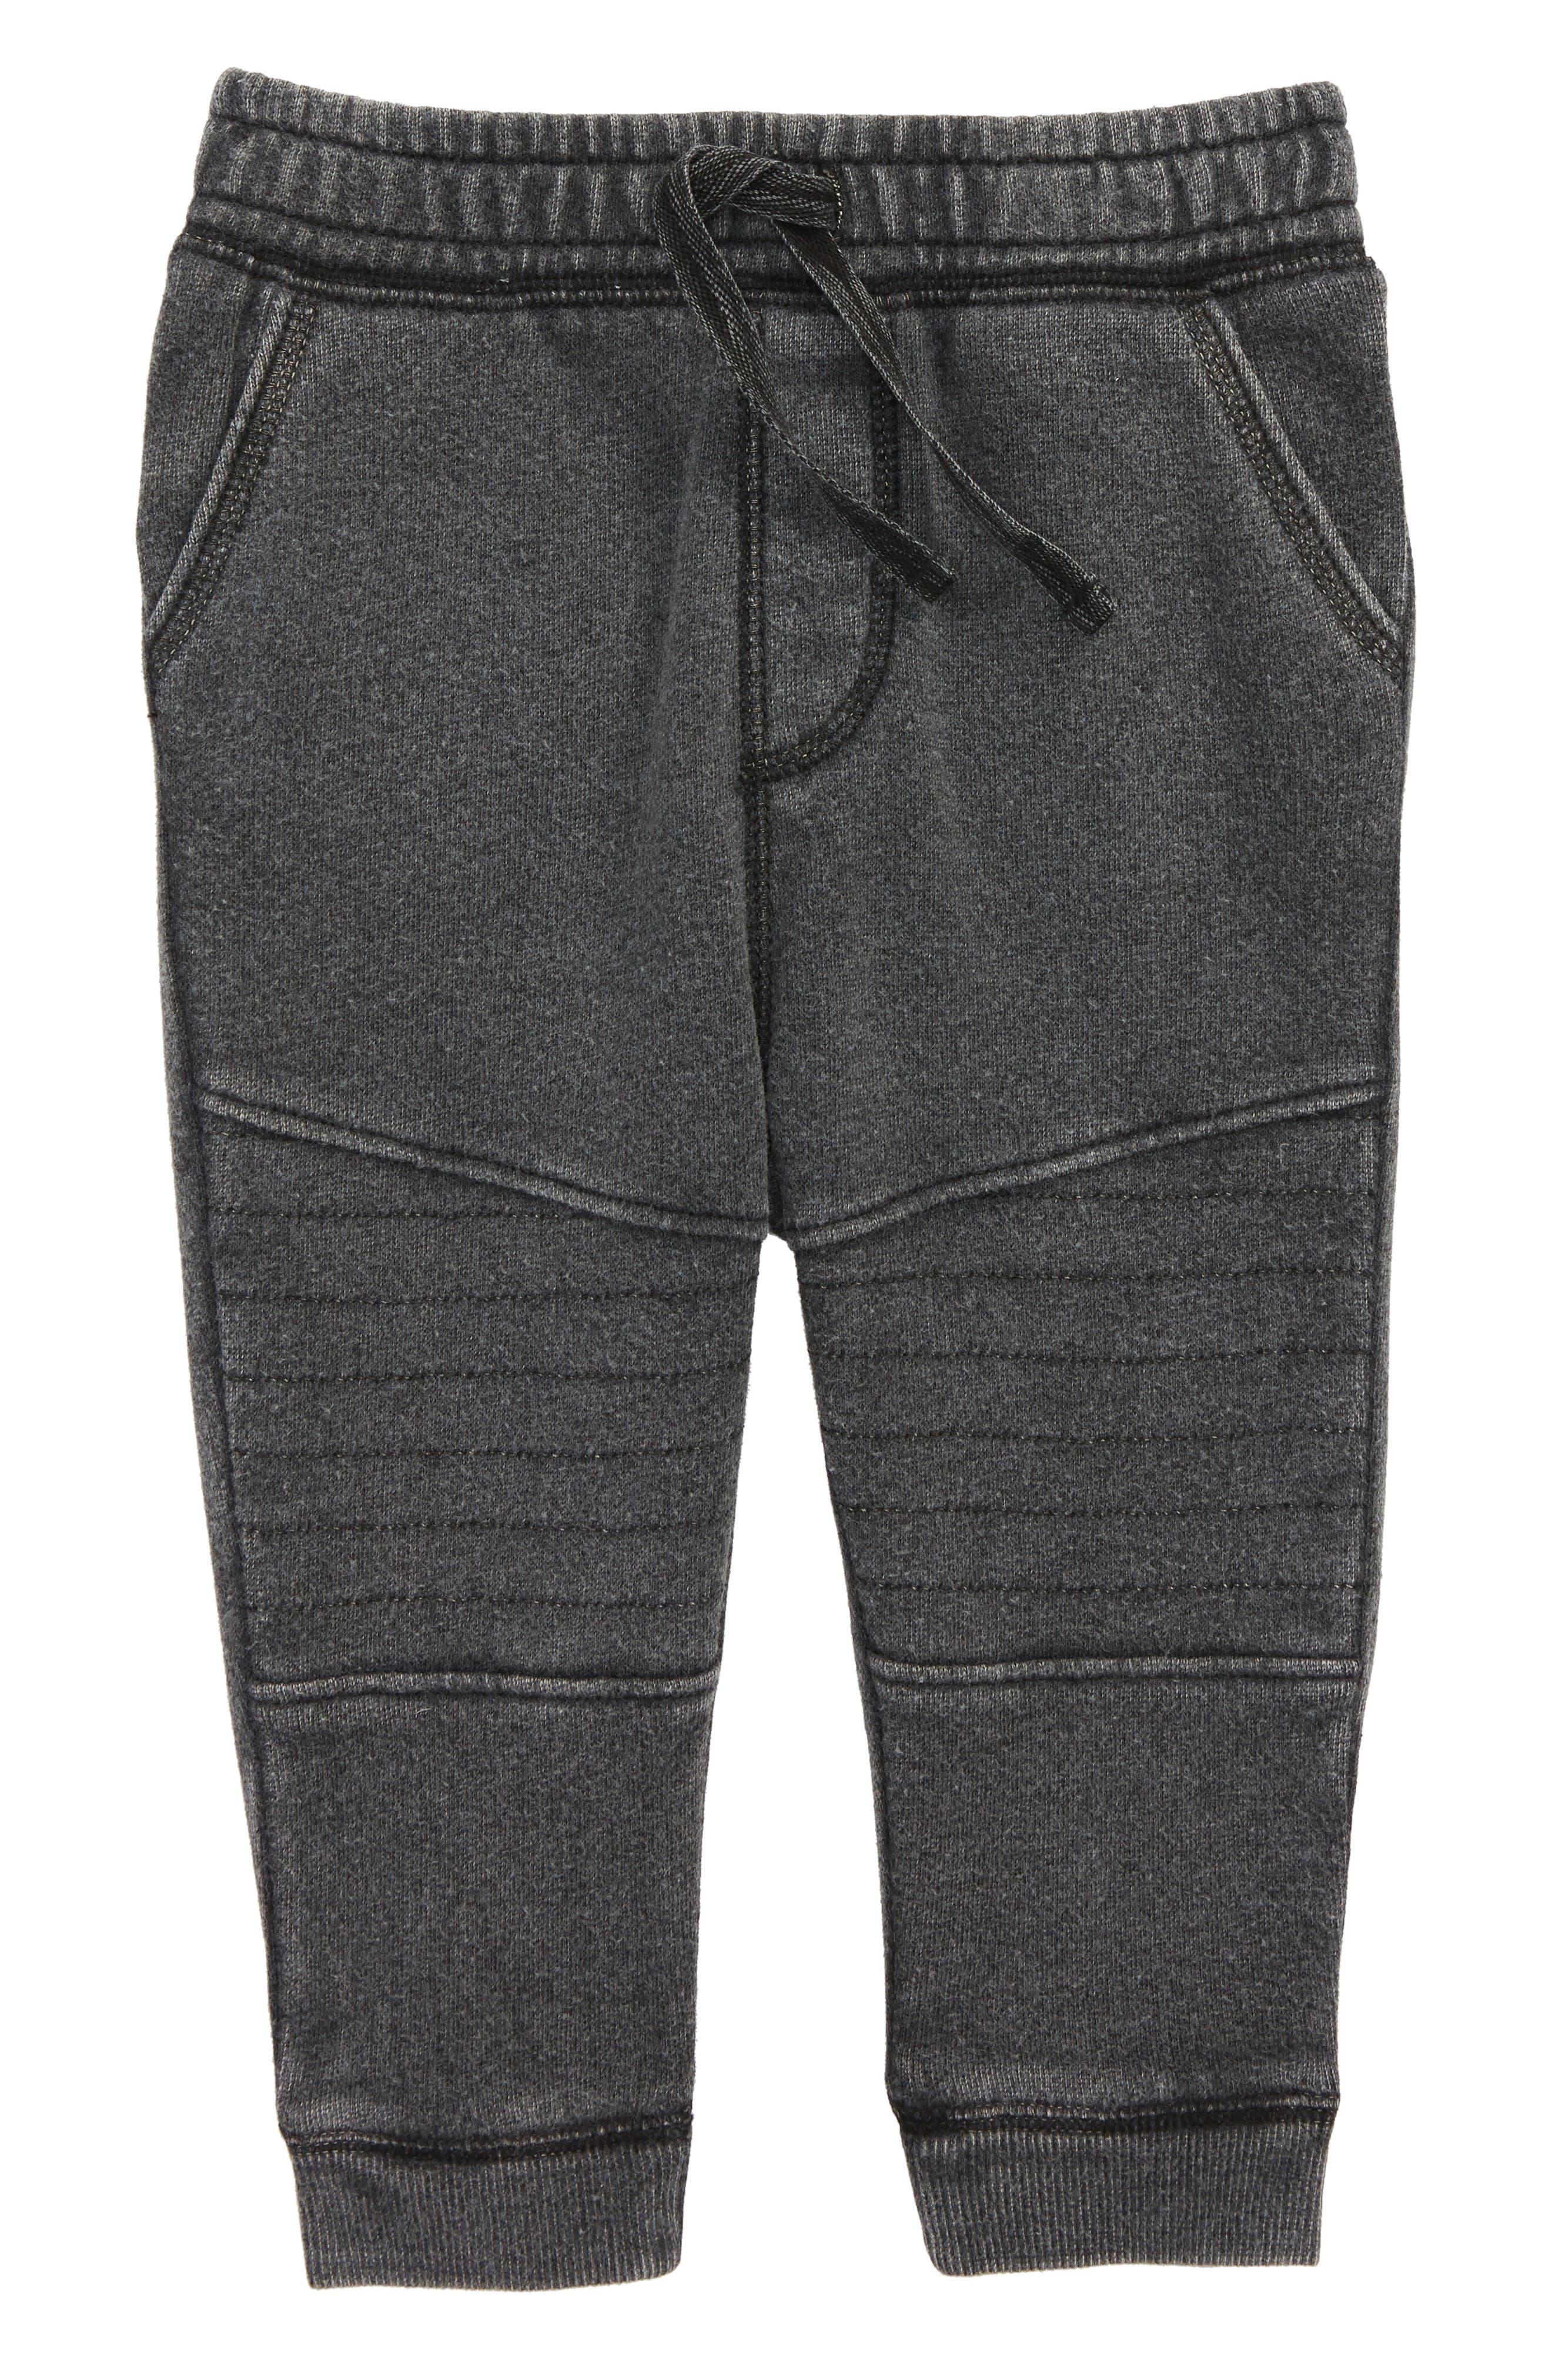 Moto Jogger Pants,                             Main thumbnail 1, color,                             Black